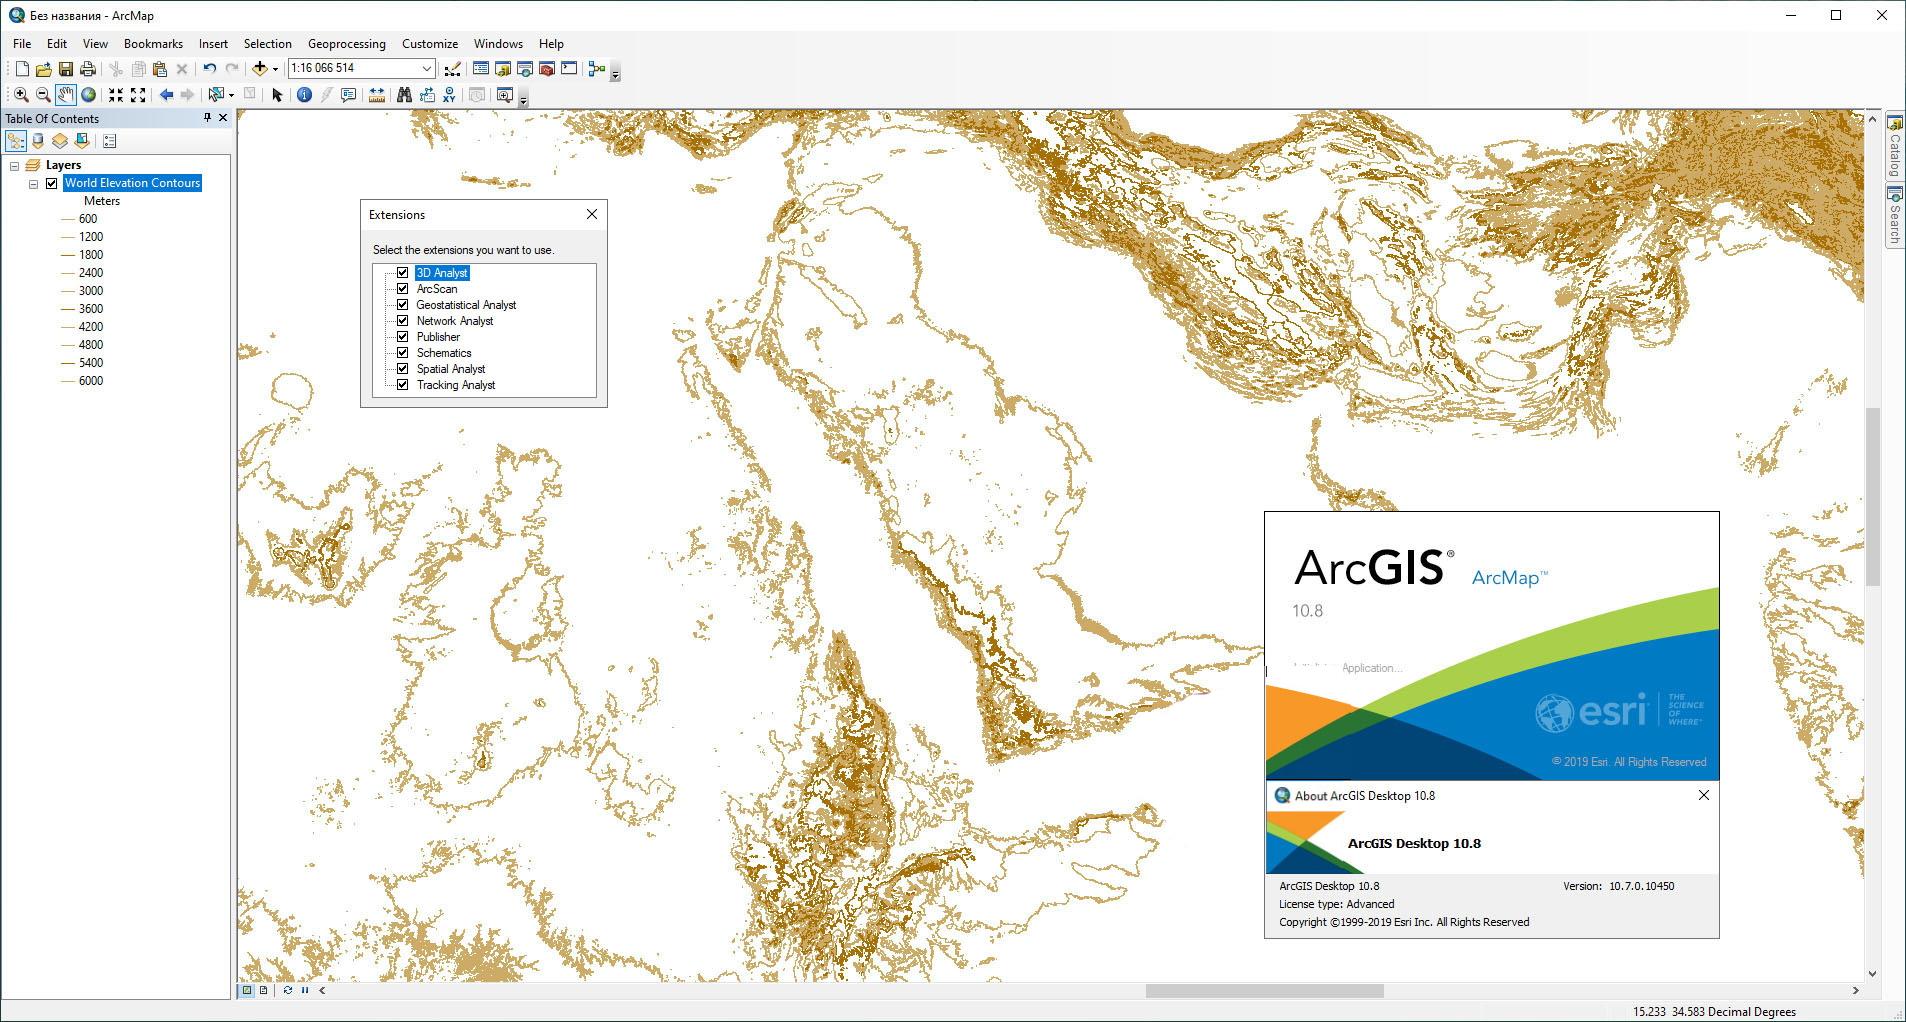 Working with Esri ArcGIS Desktop 10.8 full license